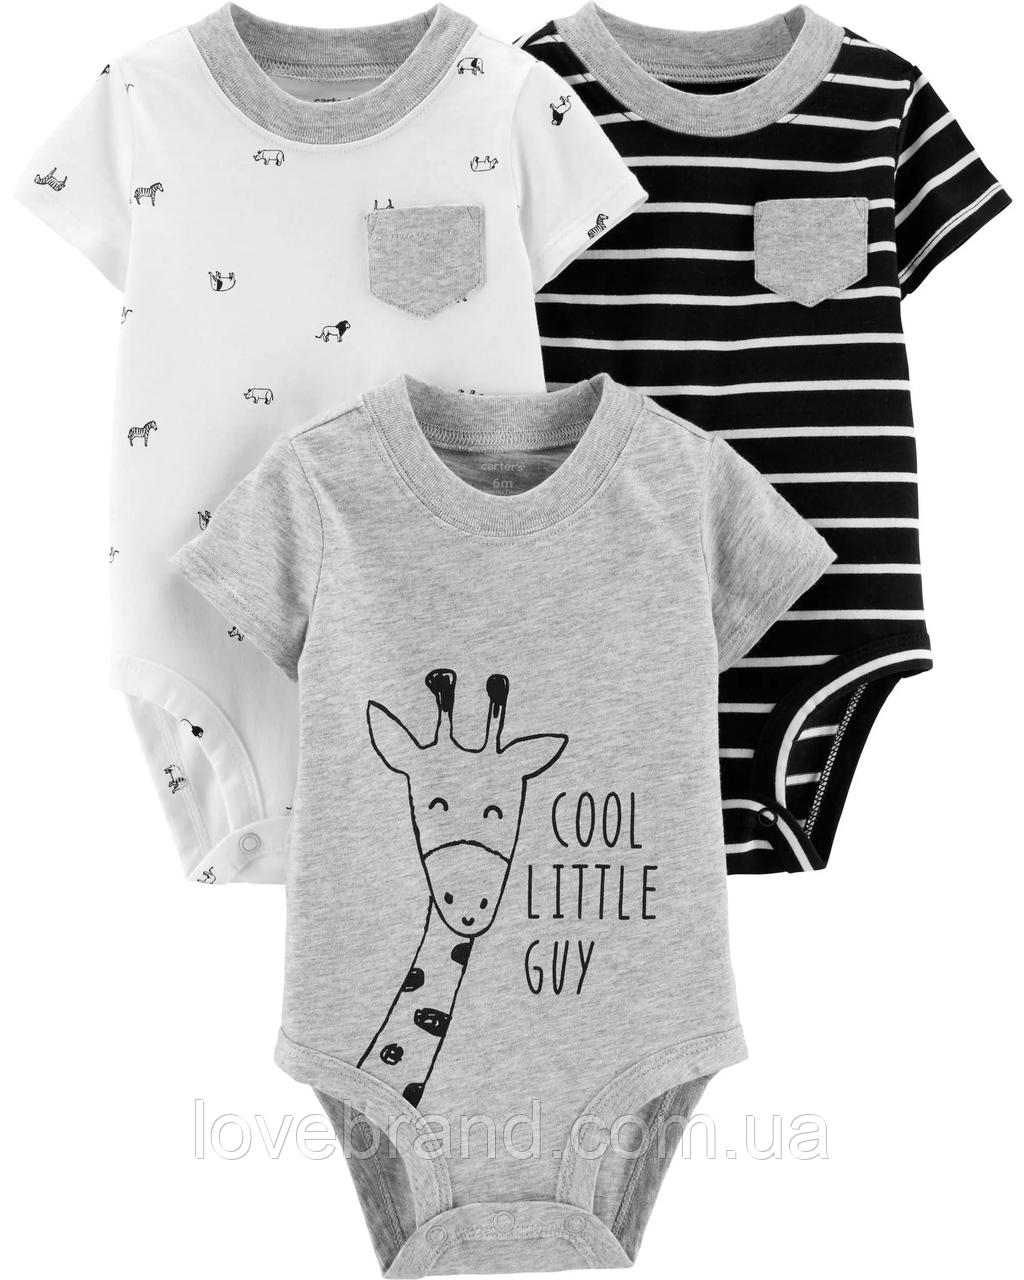 "Набор боди-футболки с картманчиком 3 шт Carter's для мальчика ""Жирафа"", бодики картерс"